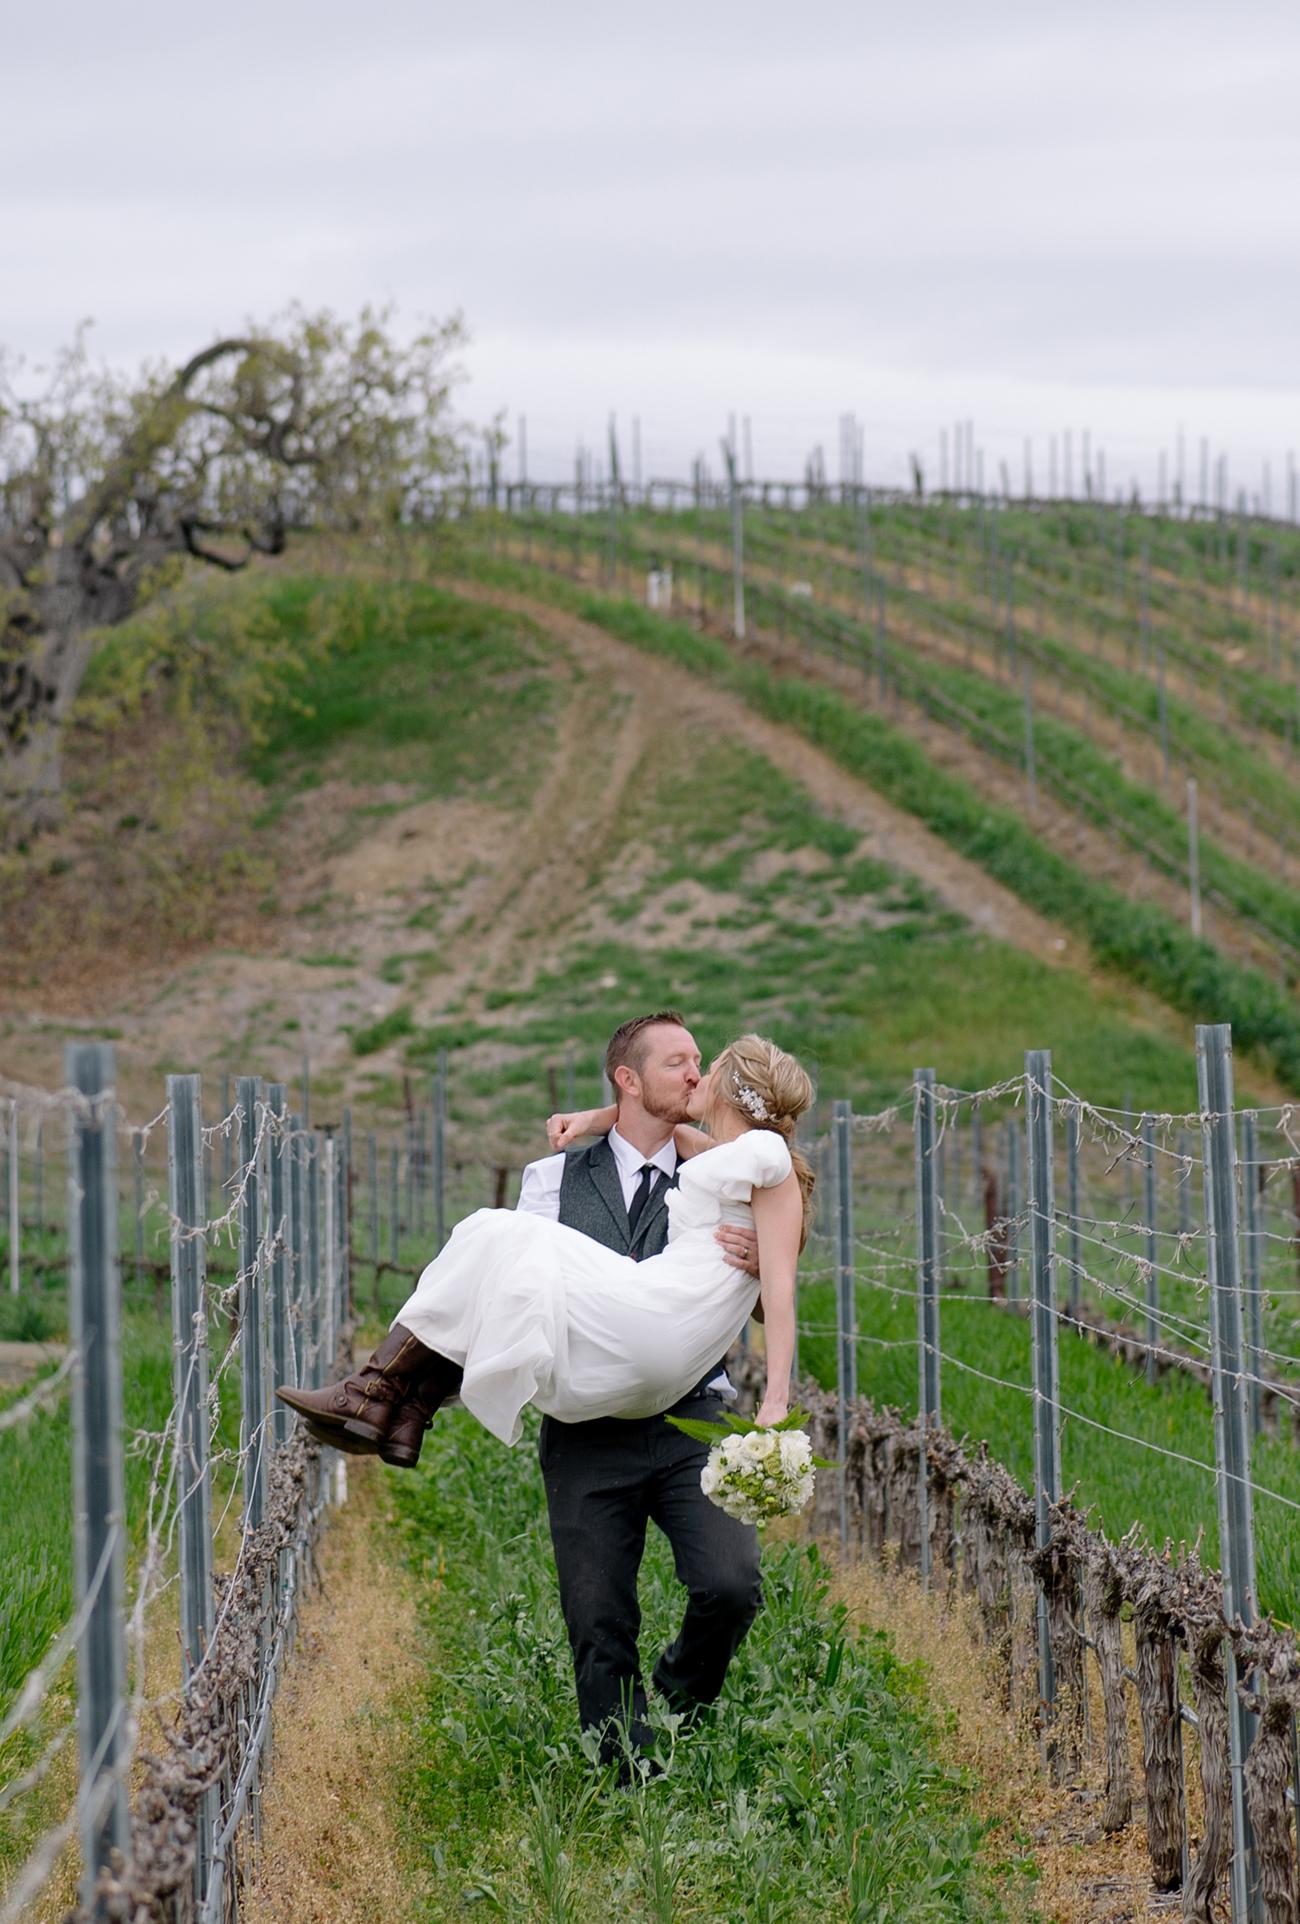 Winery_SantaBarbara_ 29